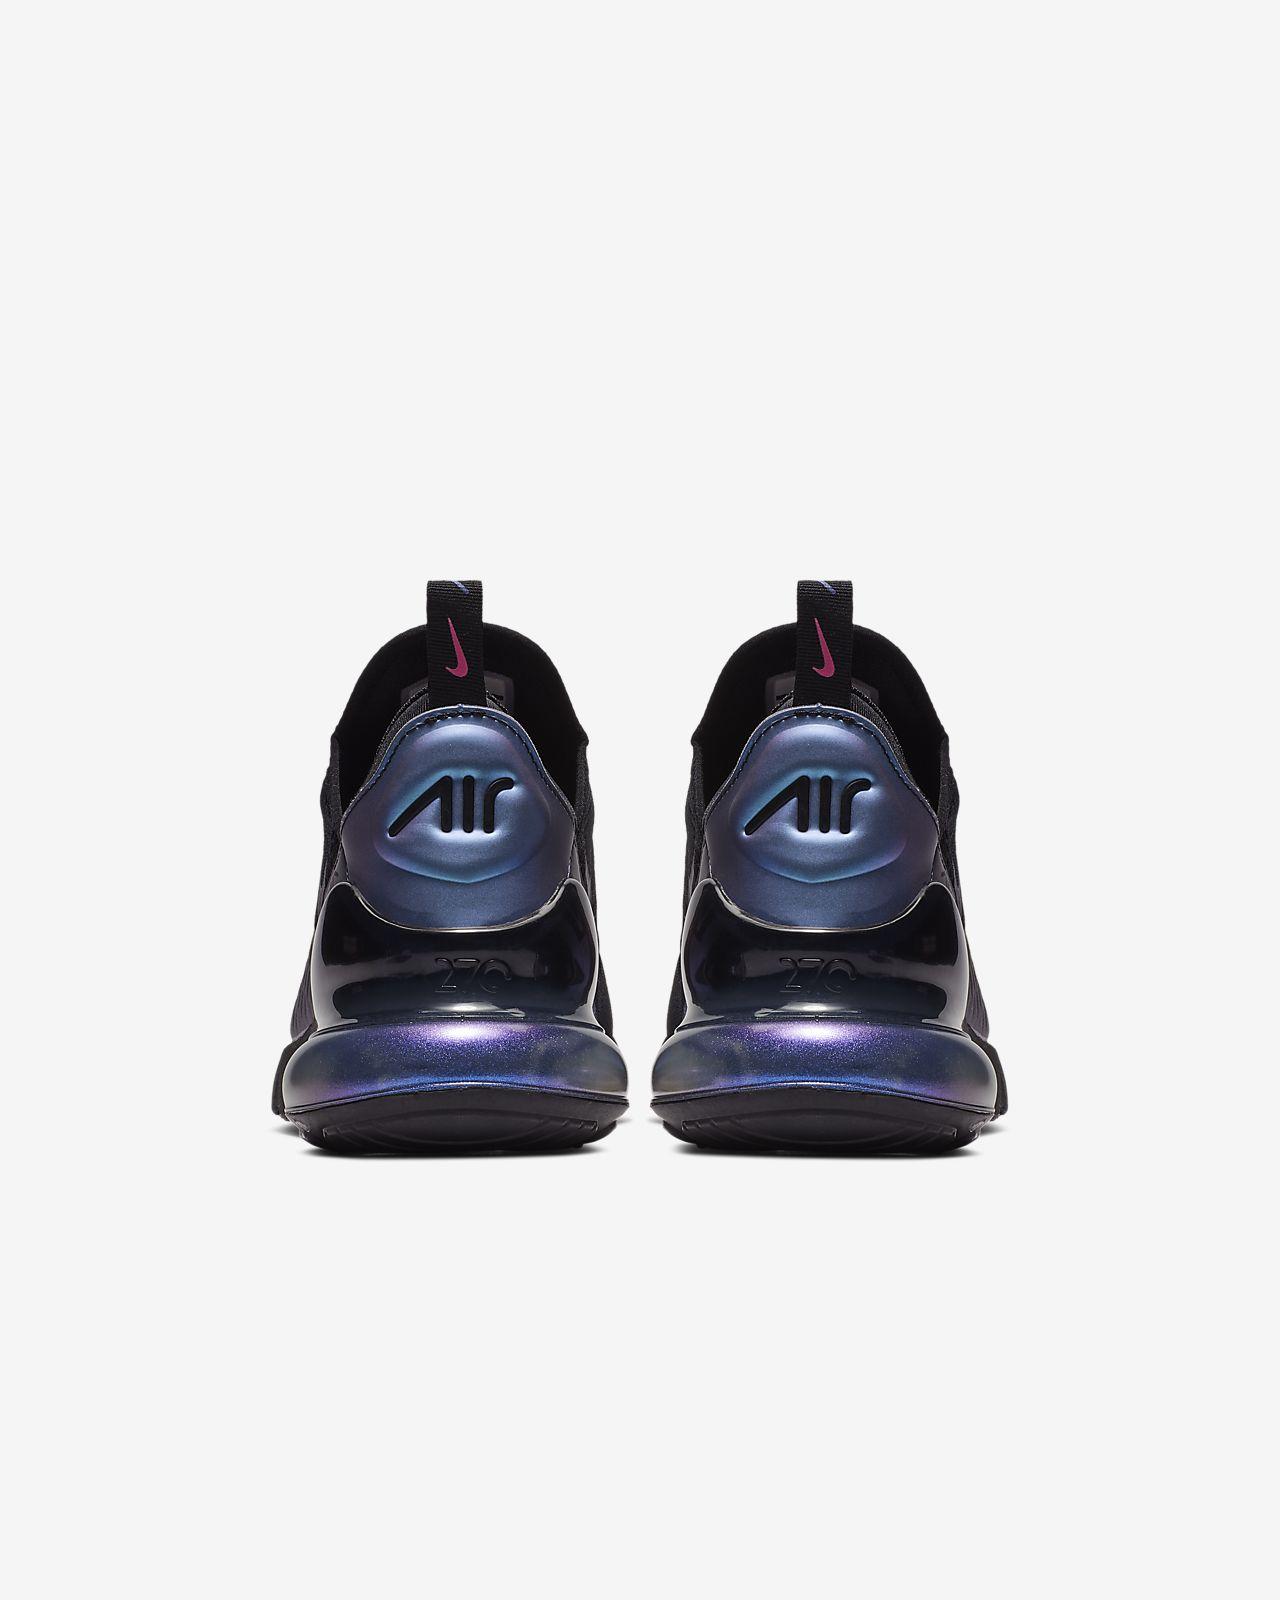 HommeBe Nike Max Chaussure Air 270 Pour FKl1Jc